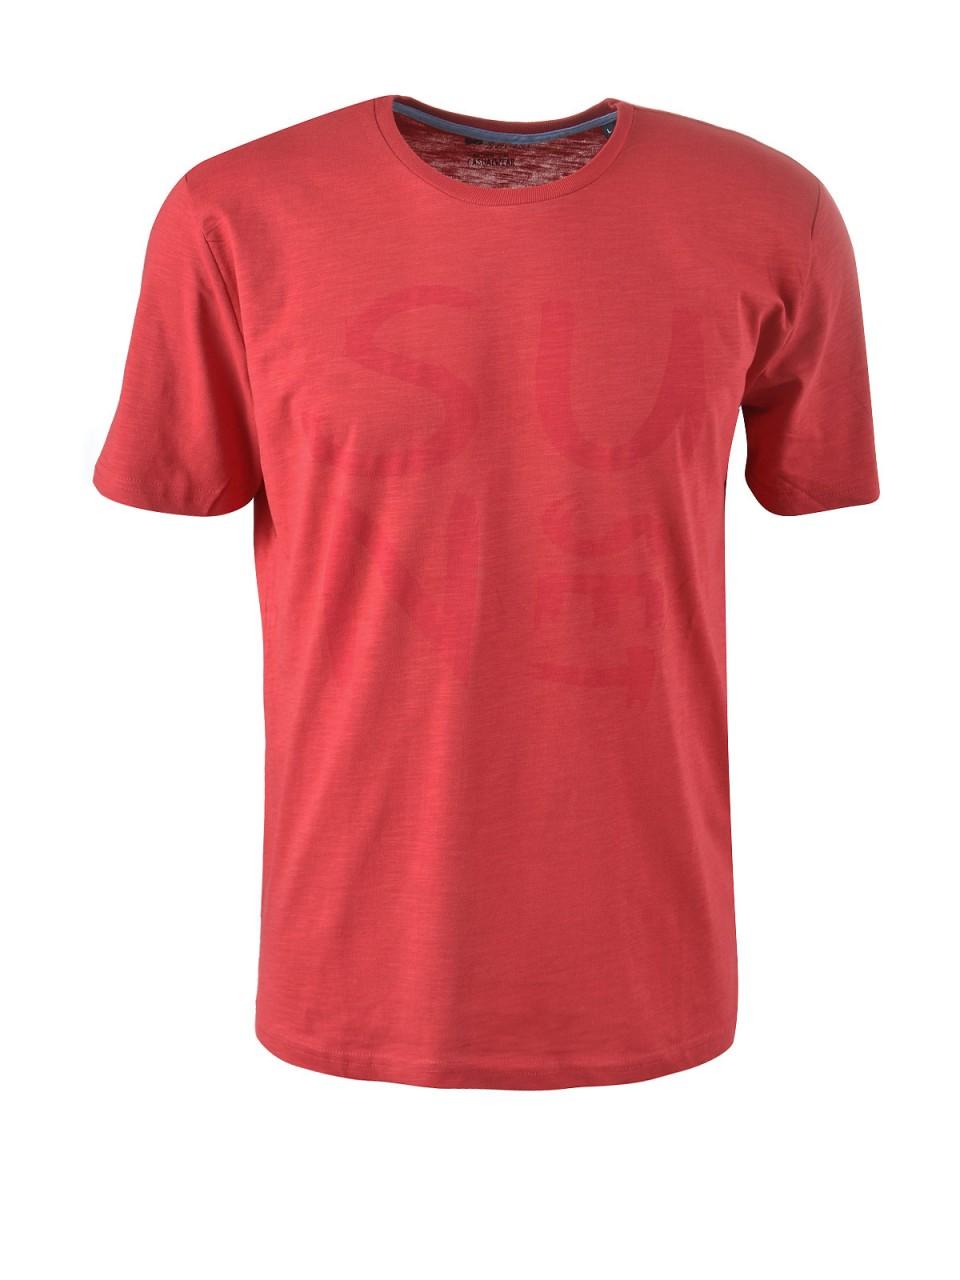 daniel-hechter-herren-t-shirt-rot, 29.95 EUR @ designermode-com-mode